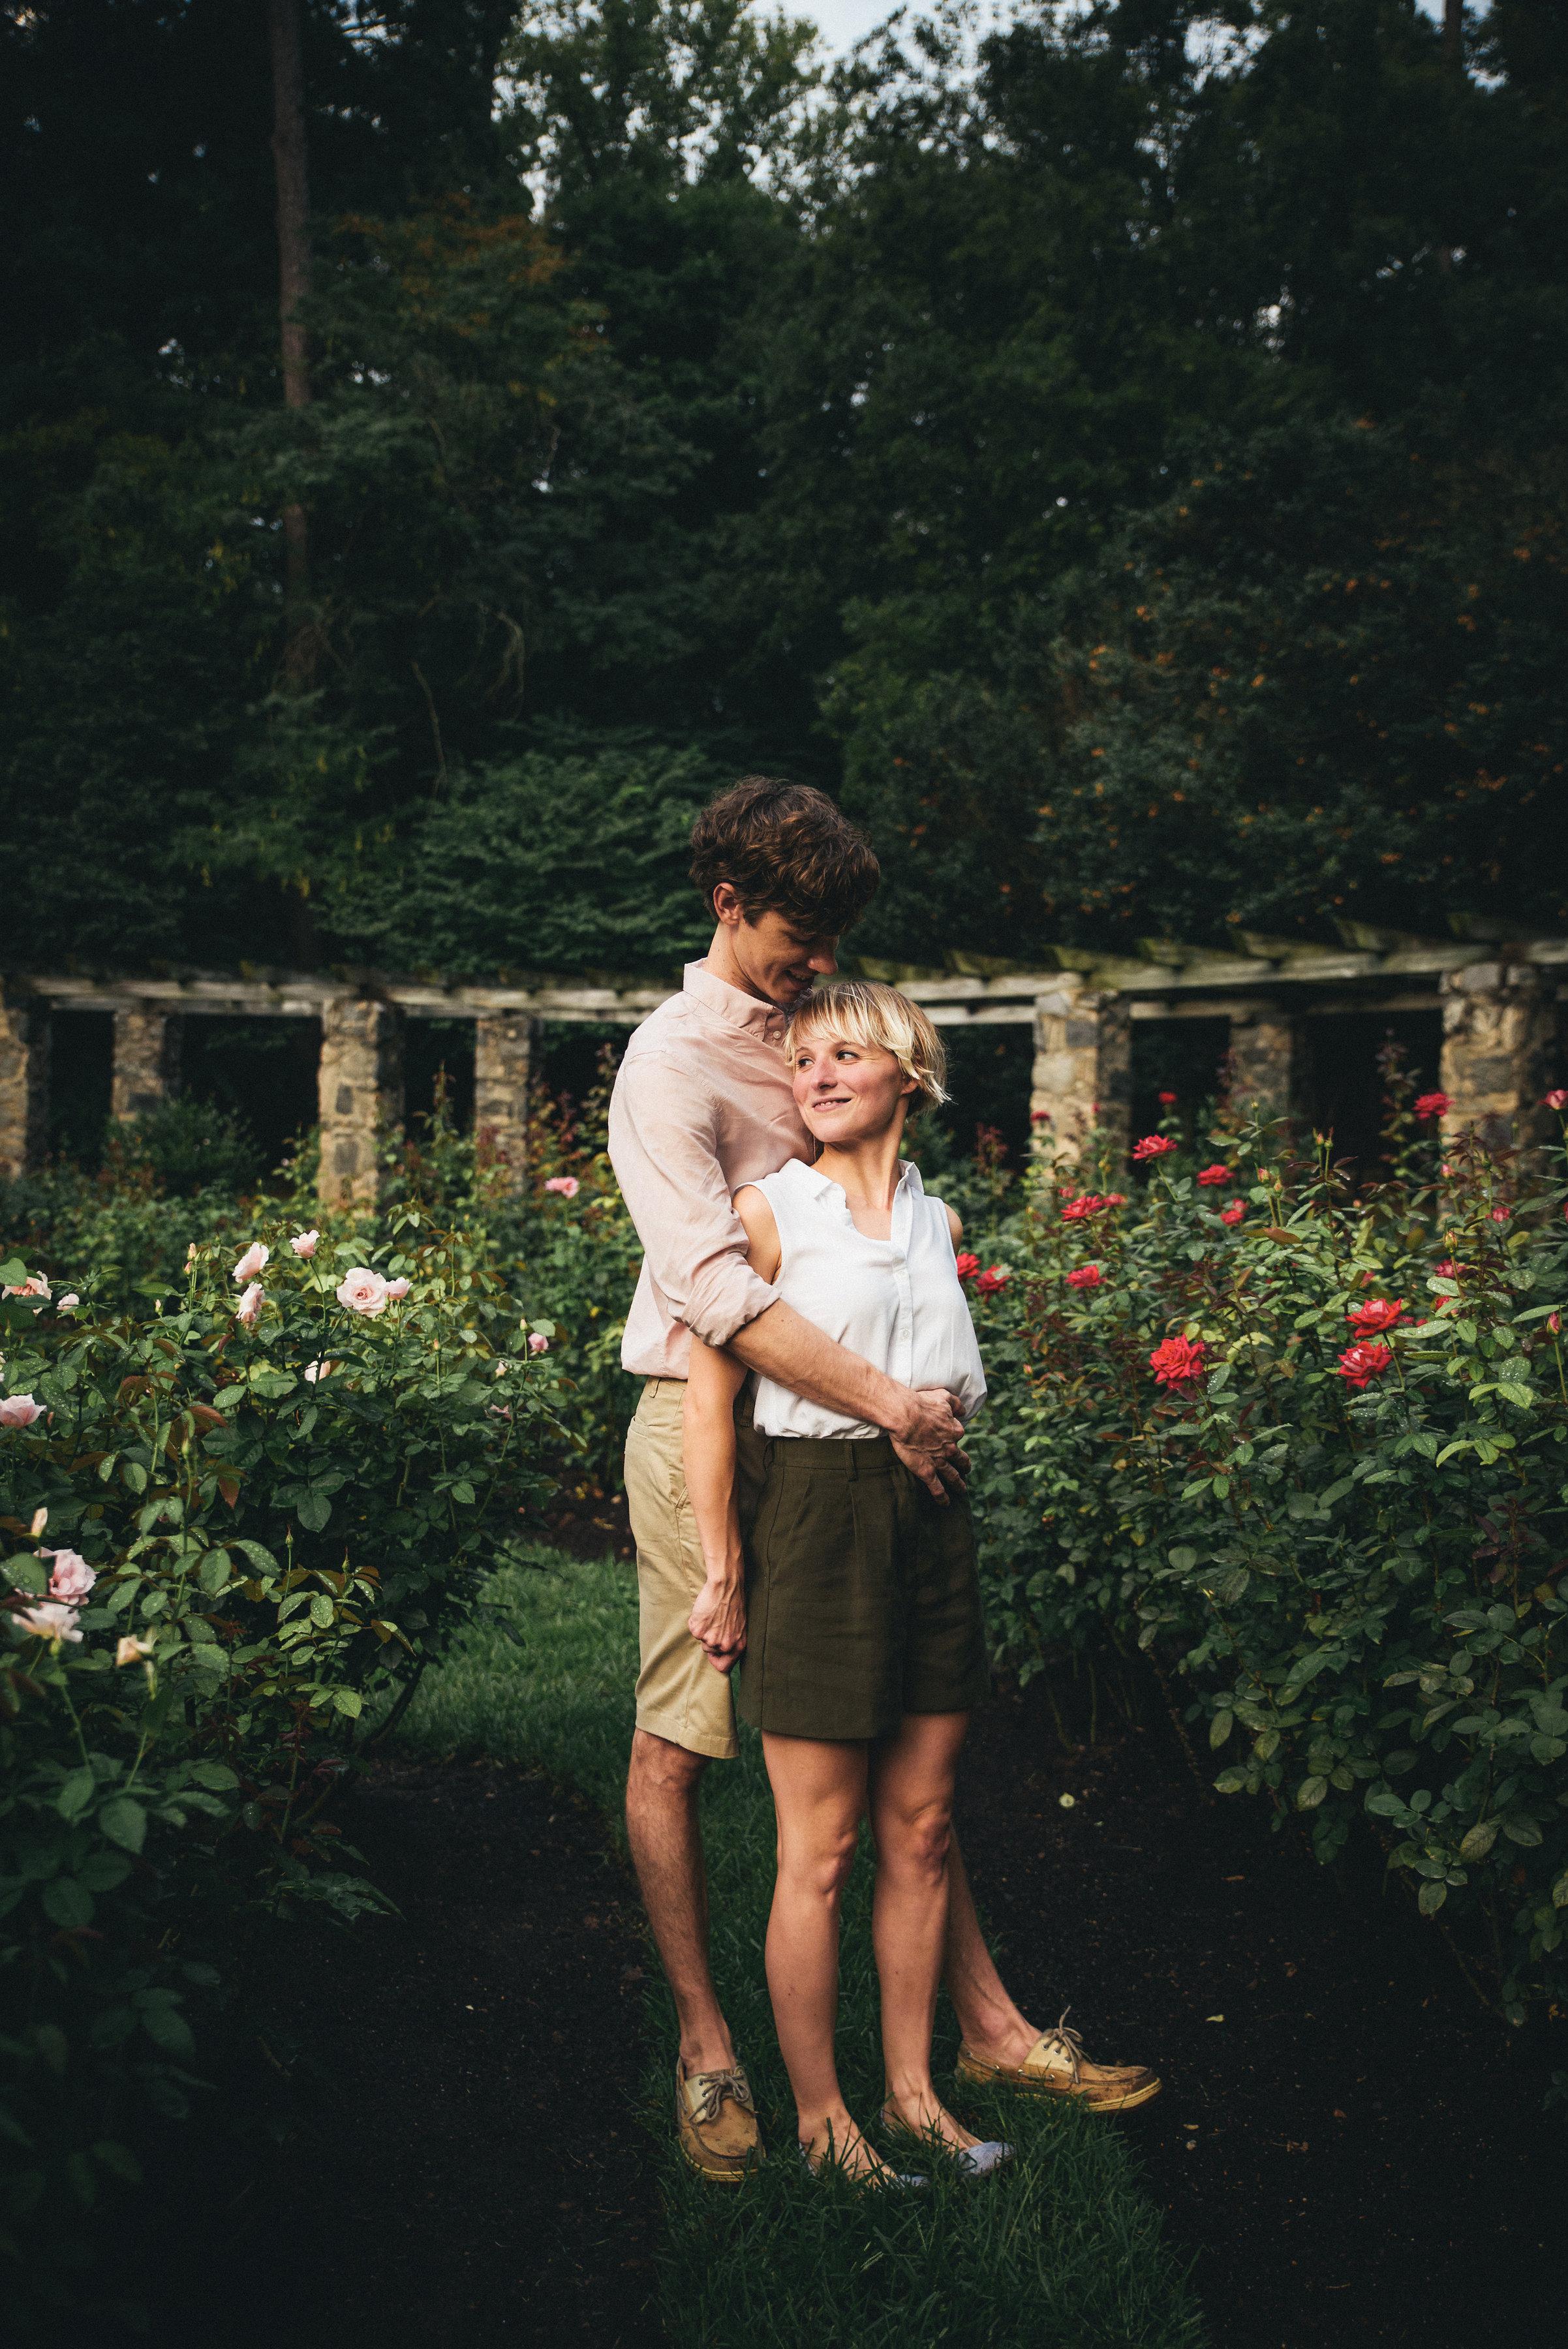 Rose Garden Engagement Session - Raleigh Engagement - North Carolina Wedding Photographer